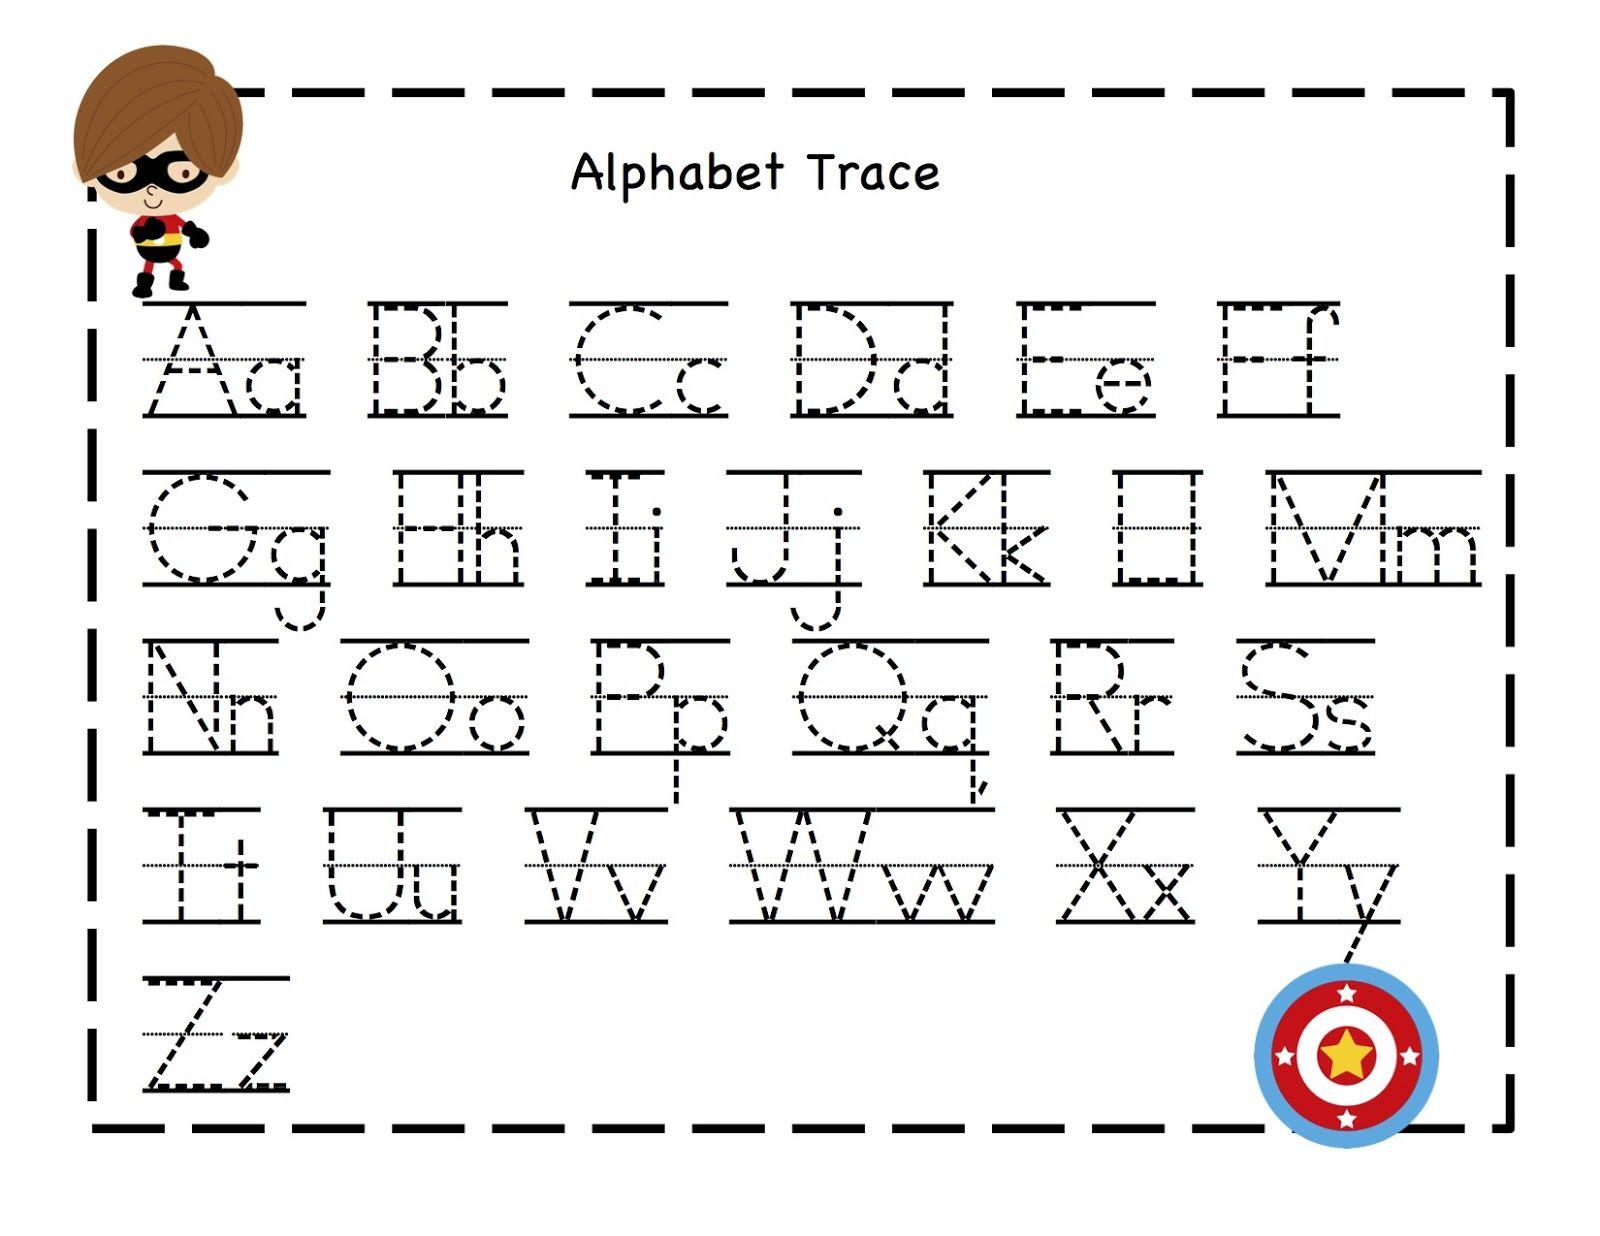 Super Hero Abc Tracing Sheets 1 | Alphabet Tracing regarding Alphabet Tracing Templates Free